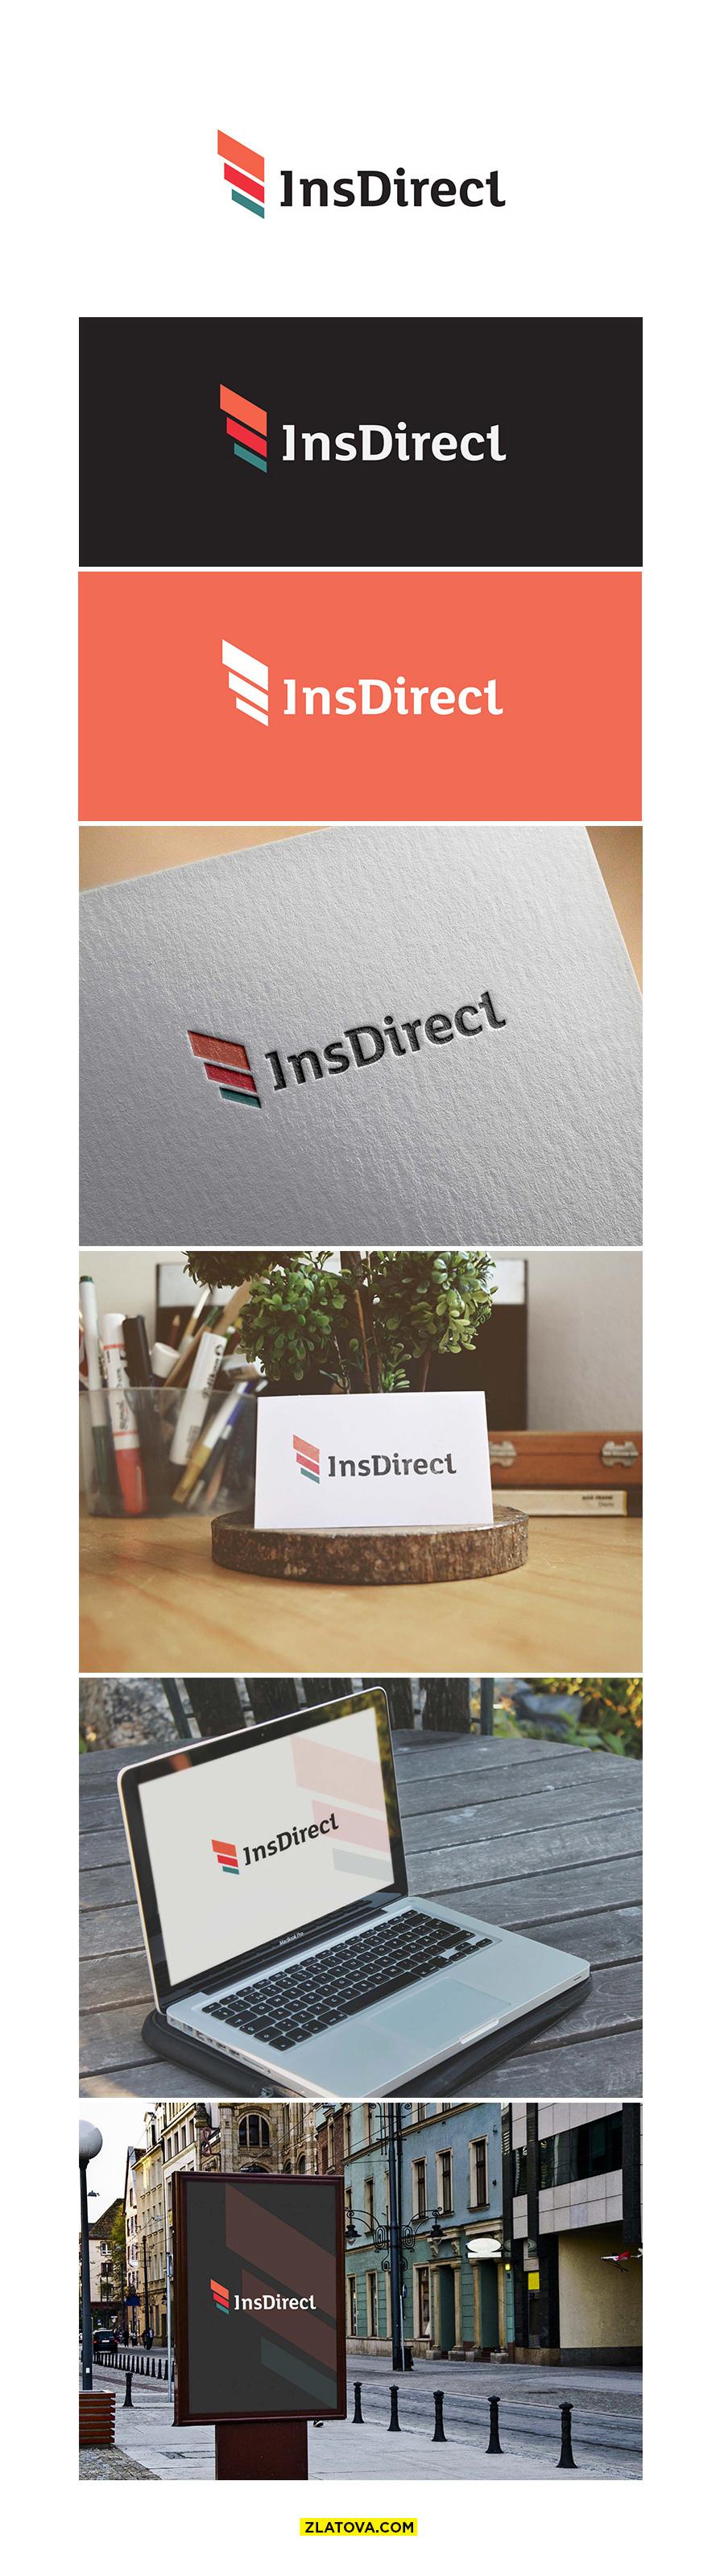 Insdirect